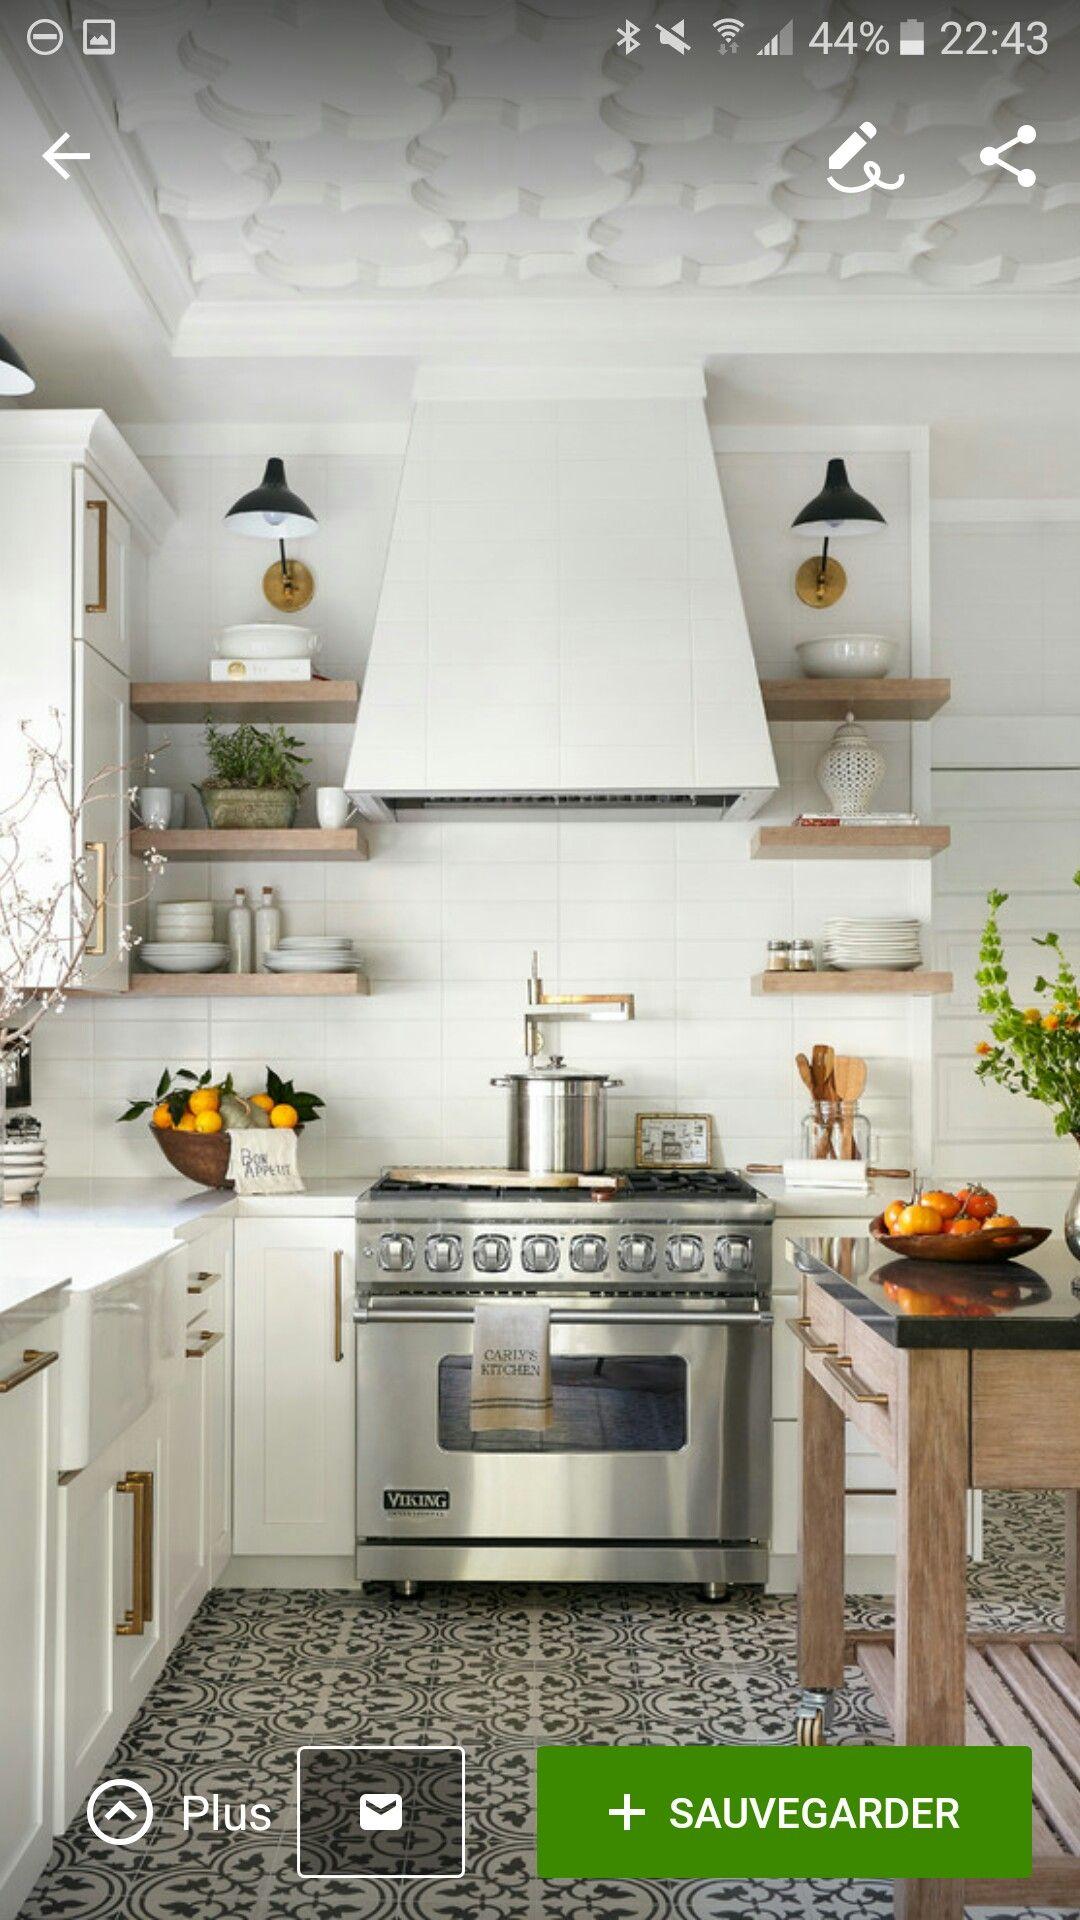 Pin by miri dorcas on heya pinterest kitchens